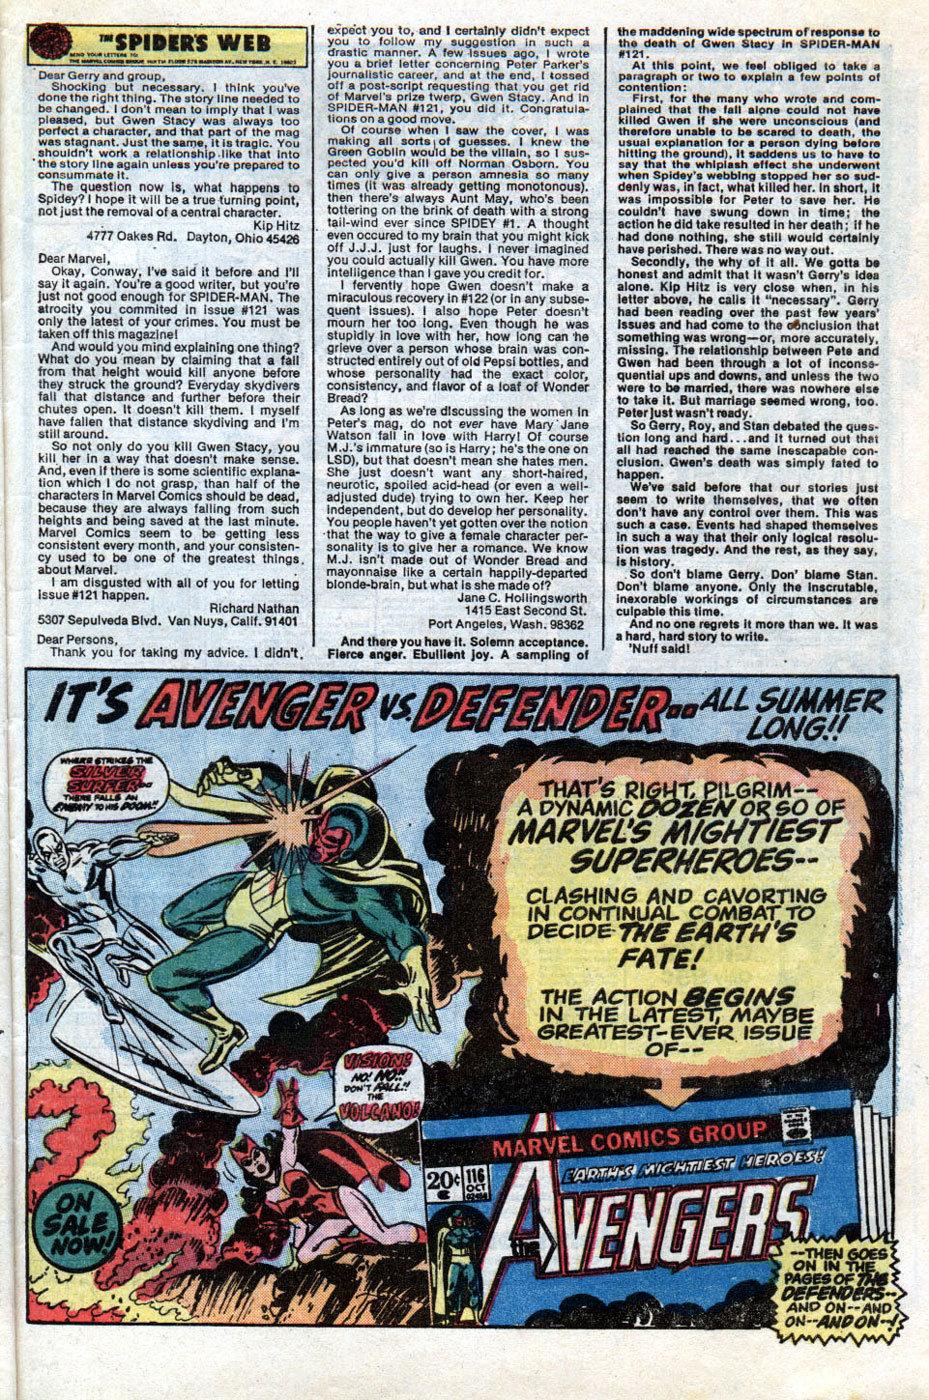 Editorial de The Amazing Spider-Man # 125, sobre a morte de Gwen Stacy